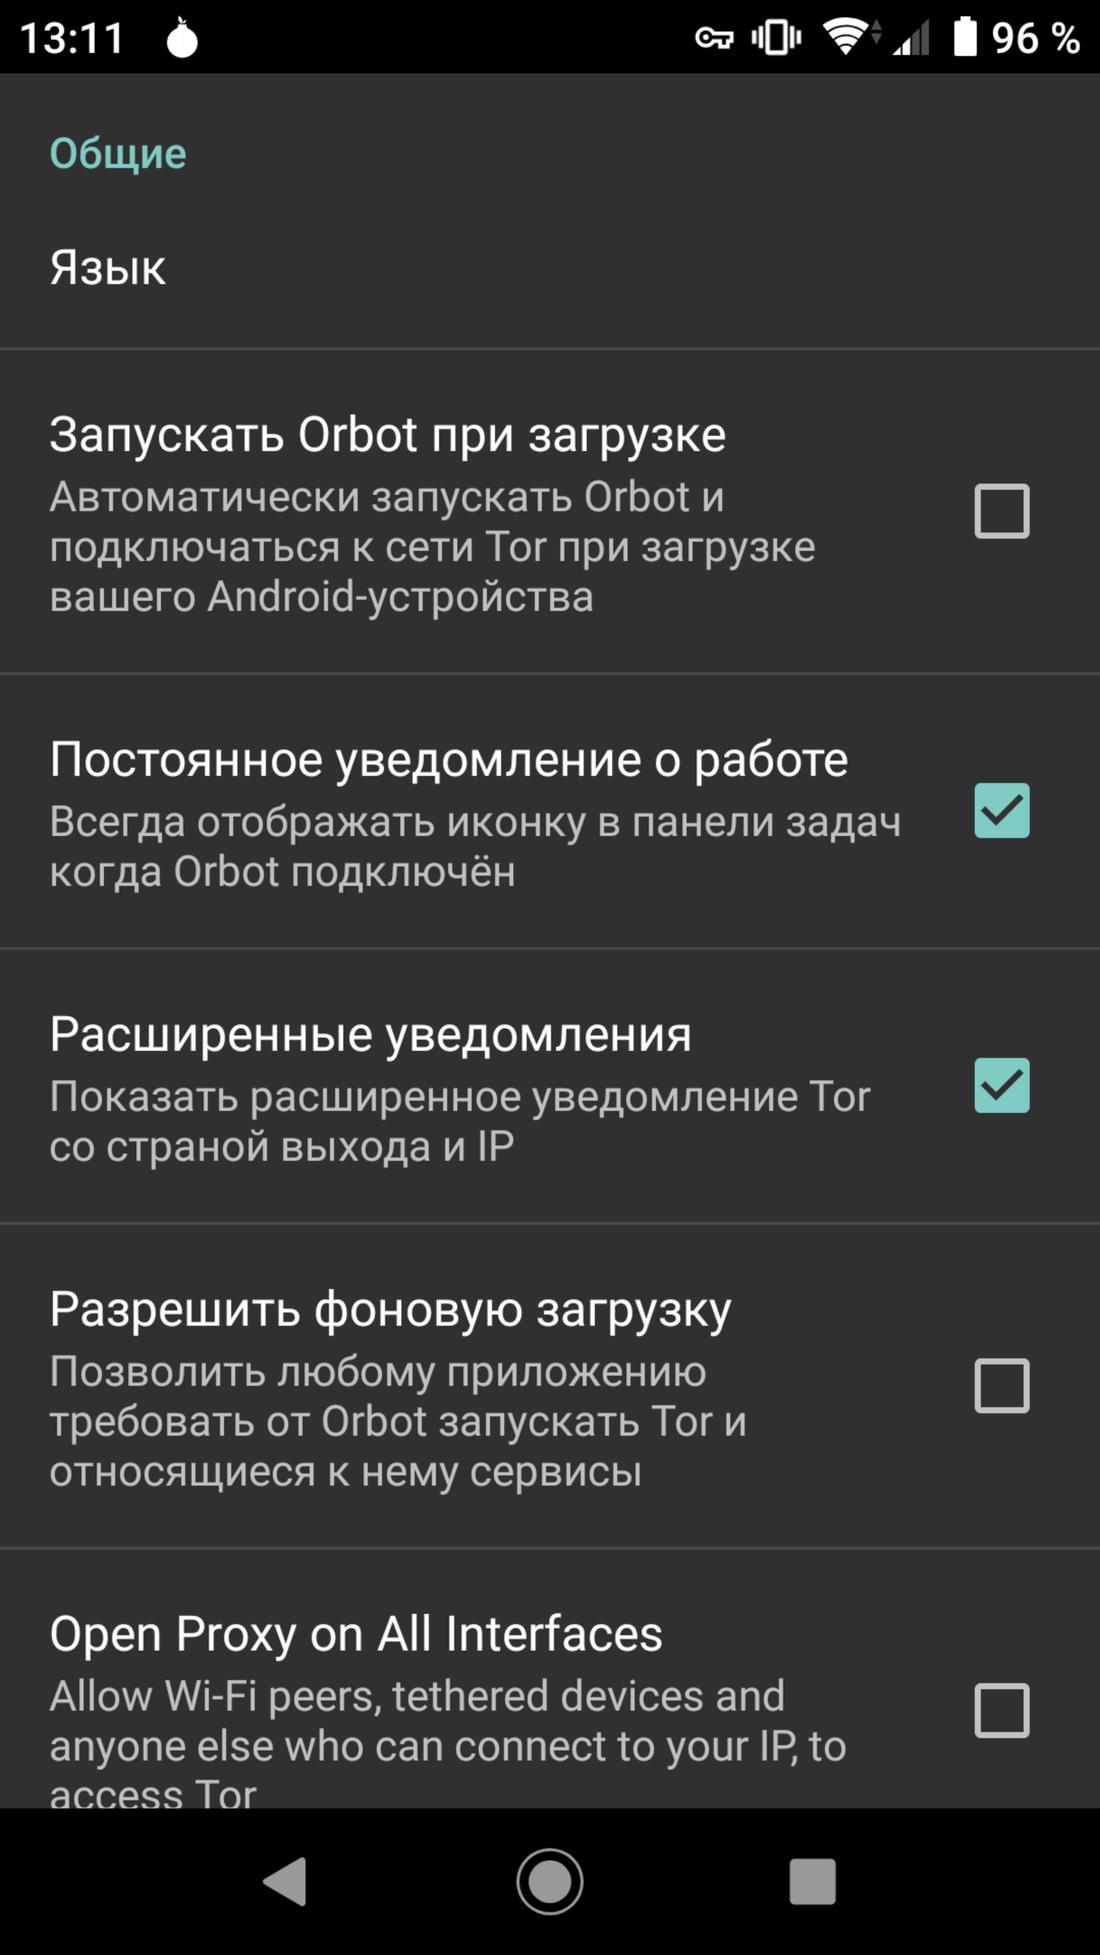 Скриншoт #1 из прoгрaммы Orbot: Proxy with Tor